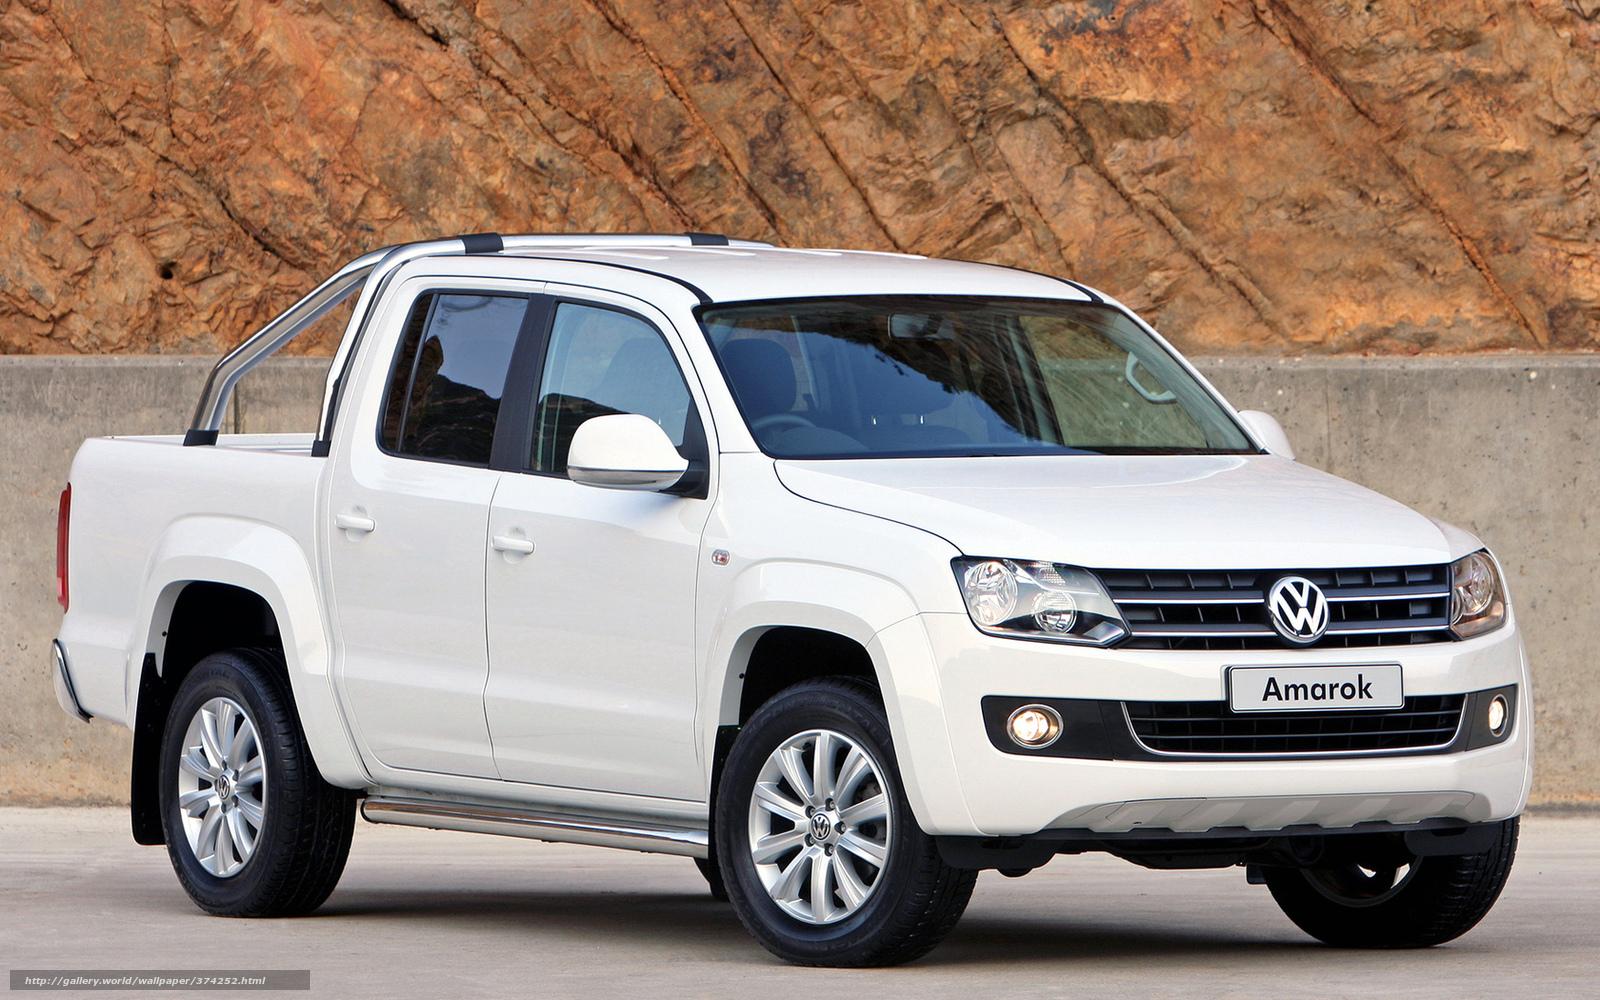 Tlcharger Fond D Ecran Volkswagen Amarok Voiture Pick